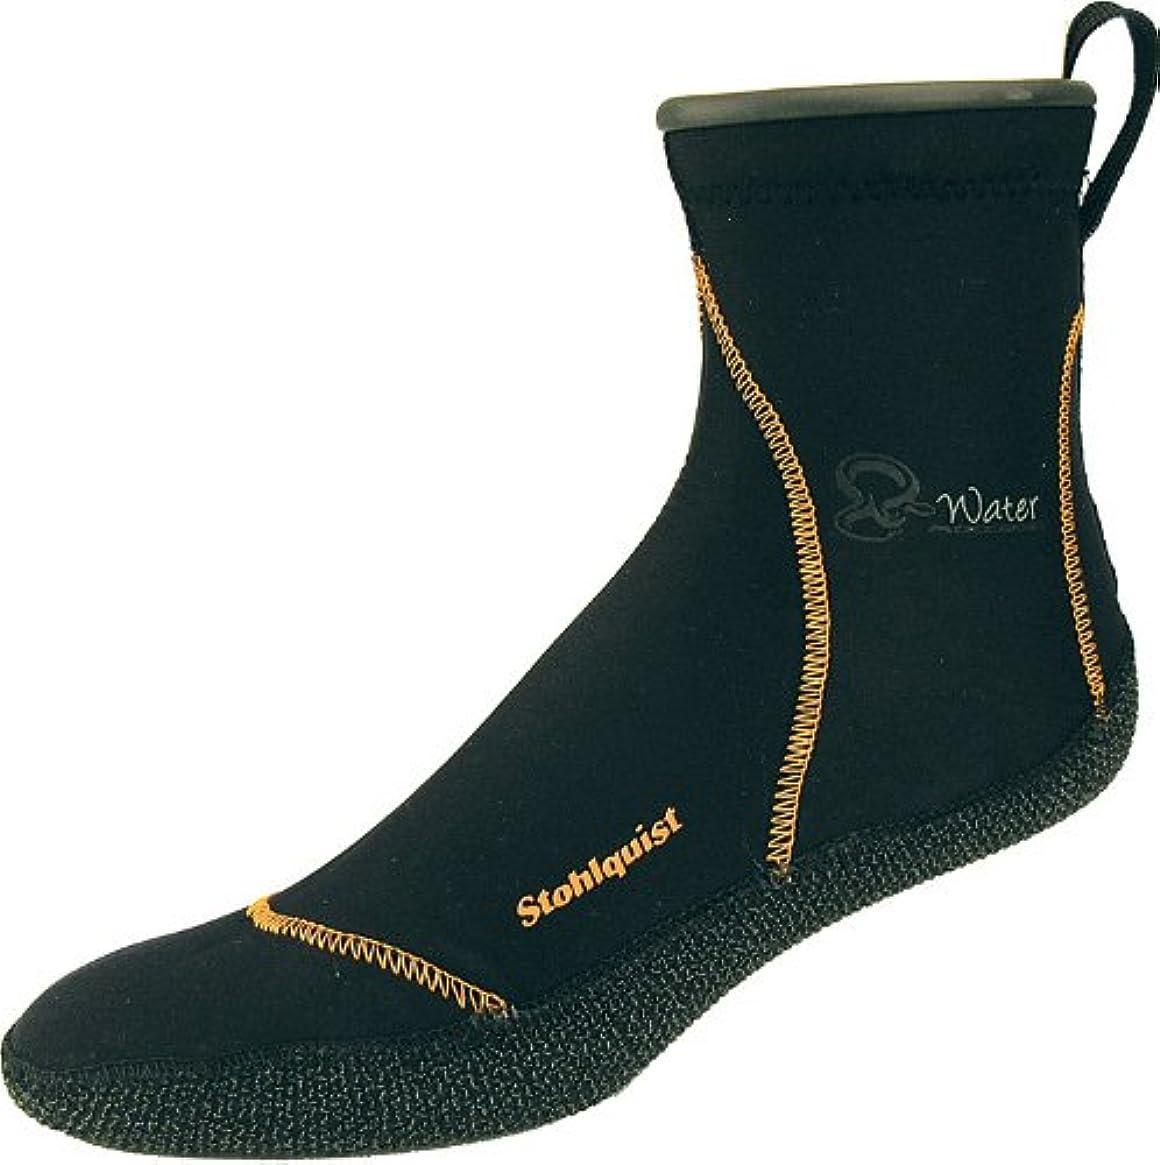 Stohlquist Watermoccasin Sock